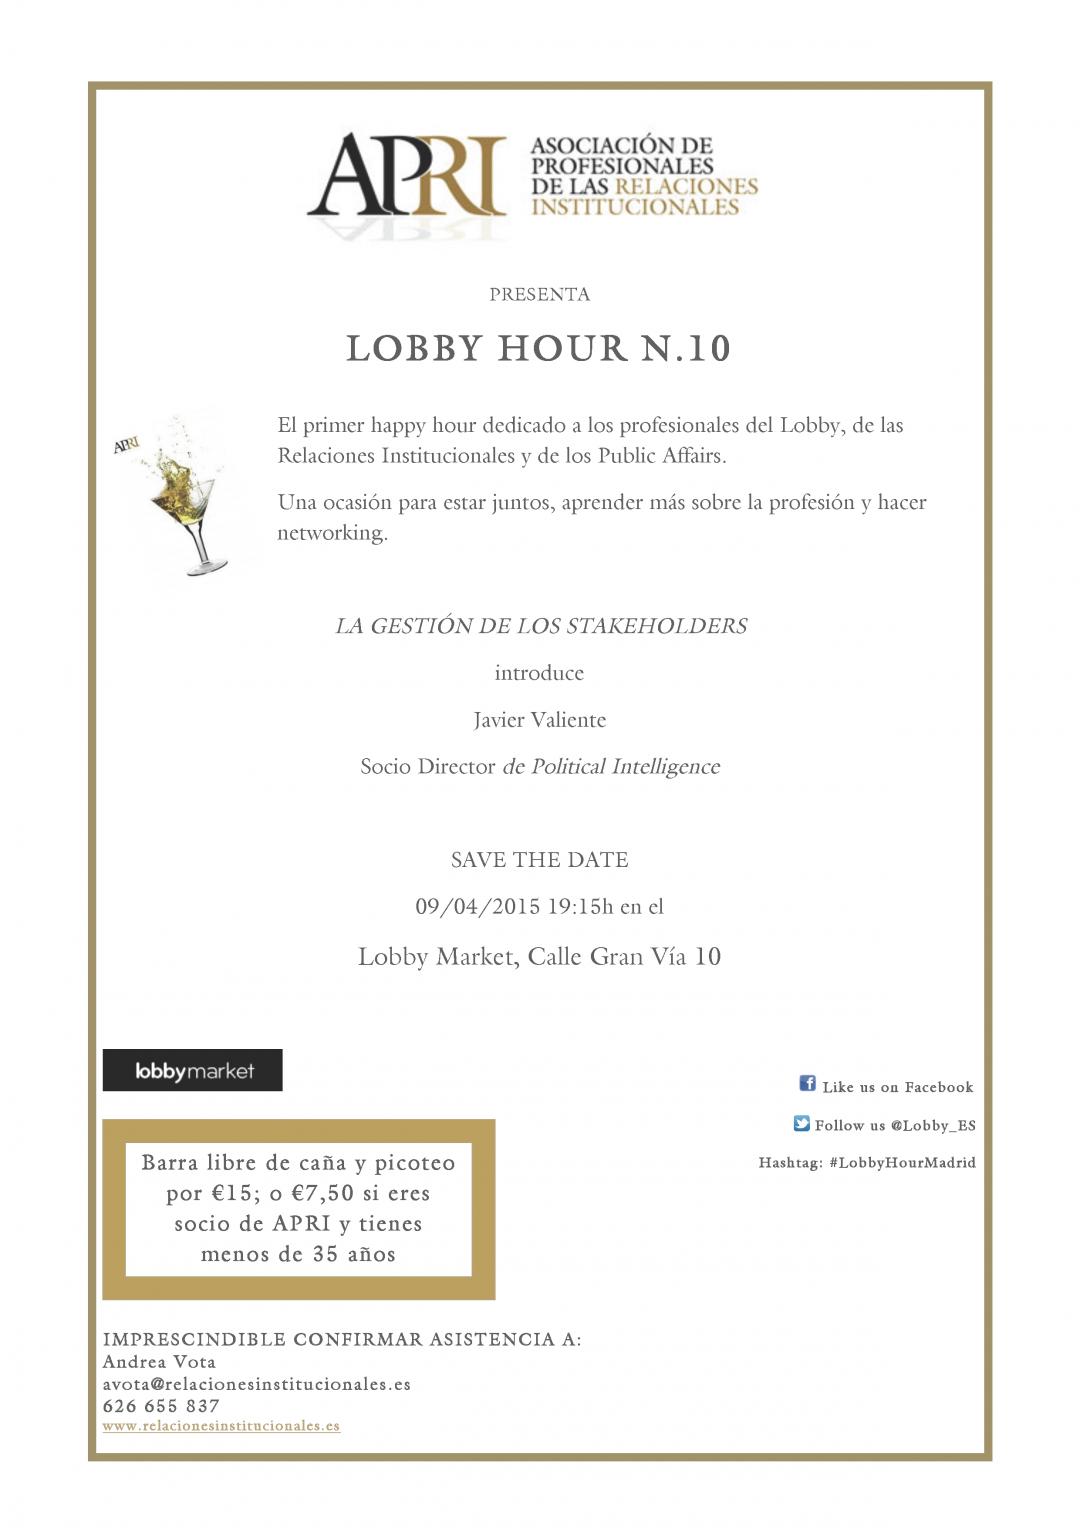 #LobbyHour N.10